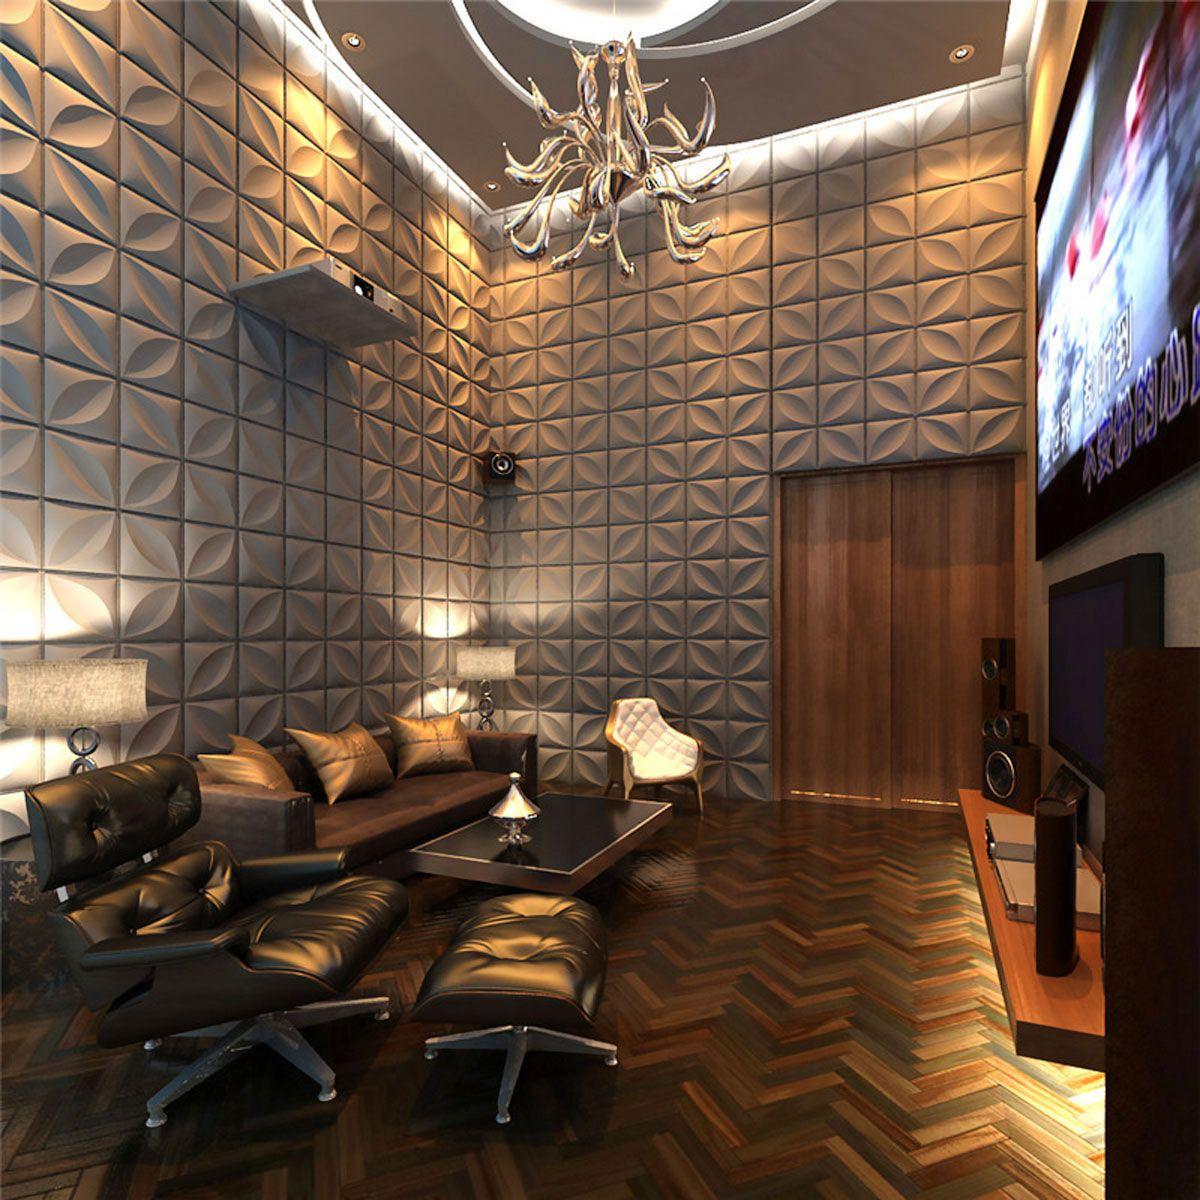 Elegant firepit with unpolished panel of oak wood using ornamental - Alexa Endurawall Decorative 3d Wall Panel White